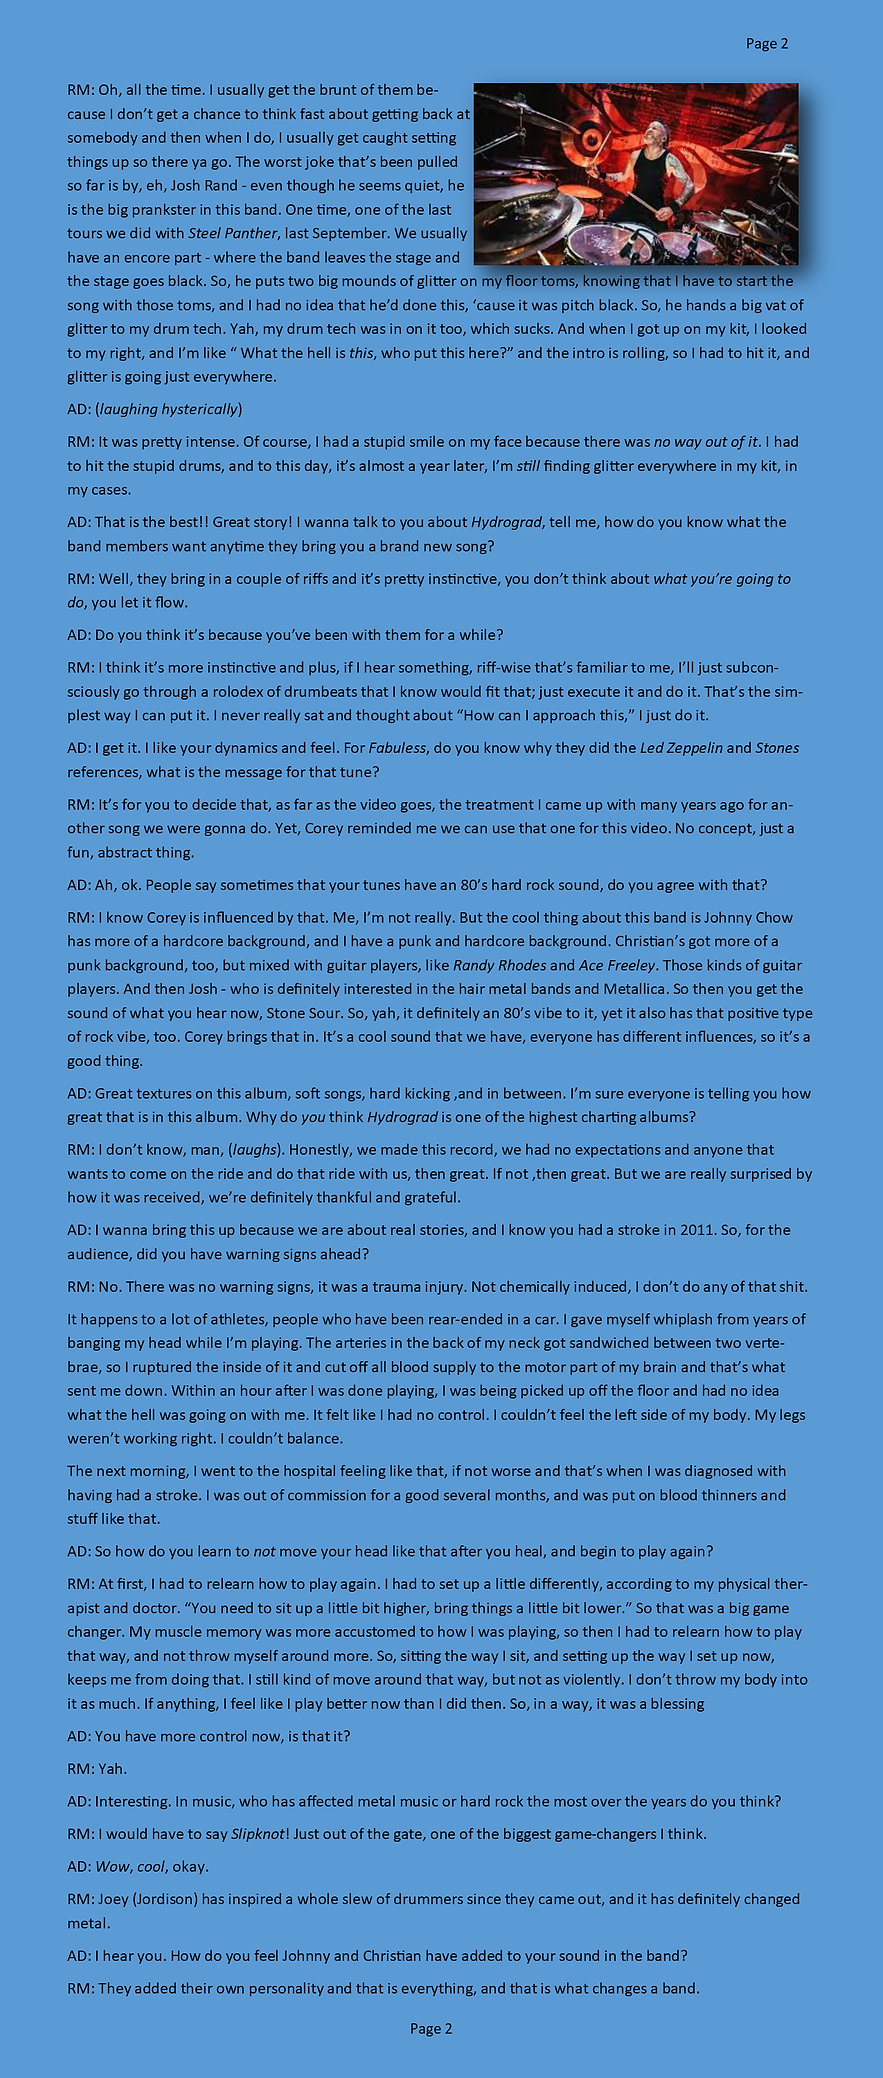 Roy Mayorga Page 2 (2) FINAL.png